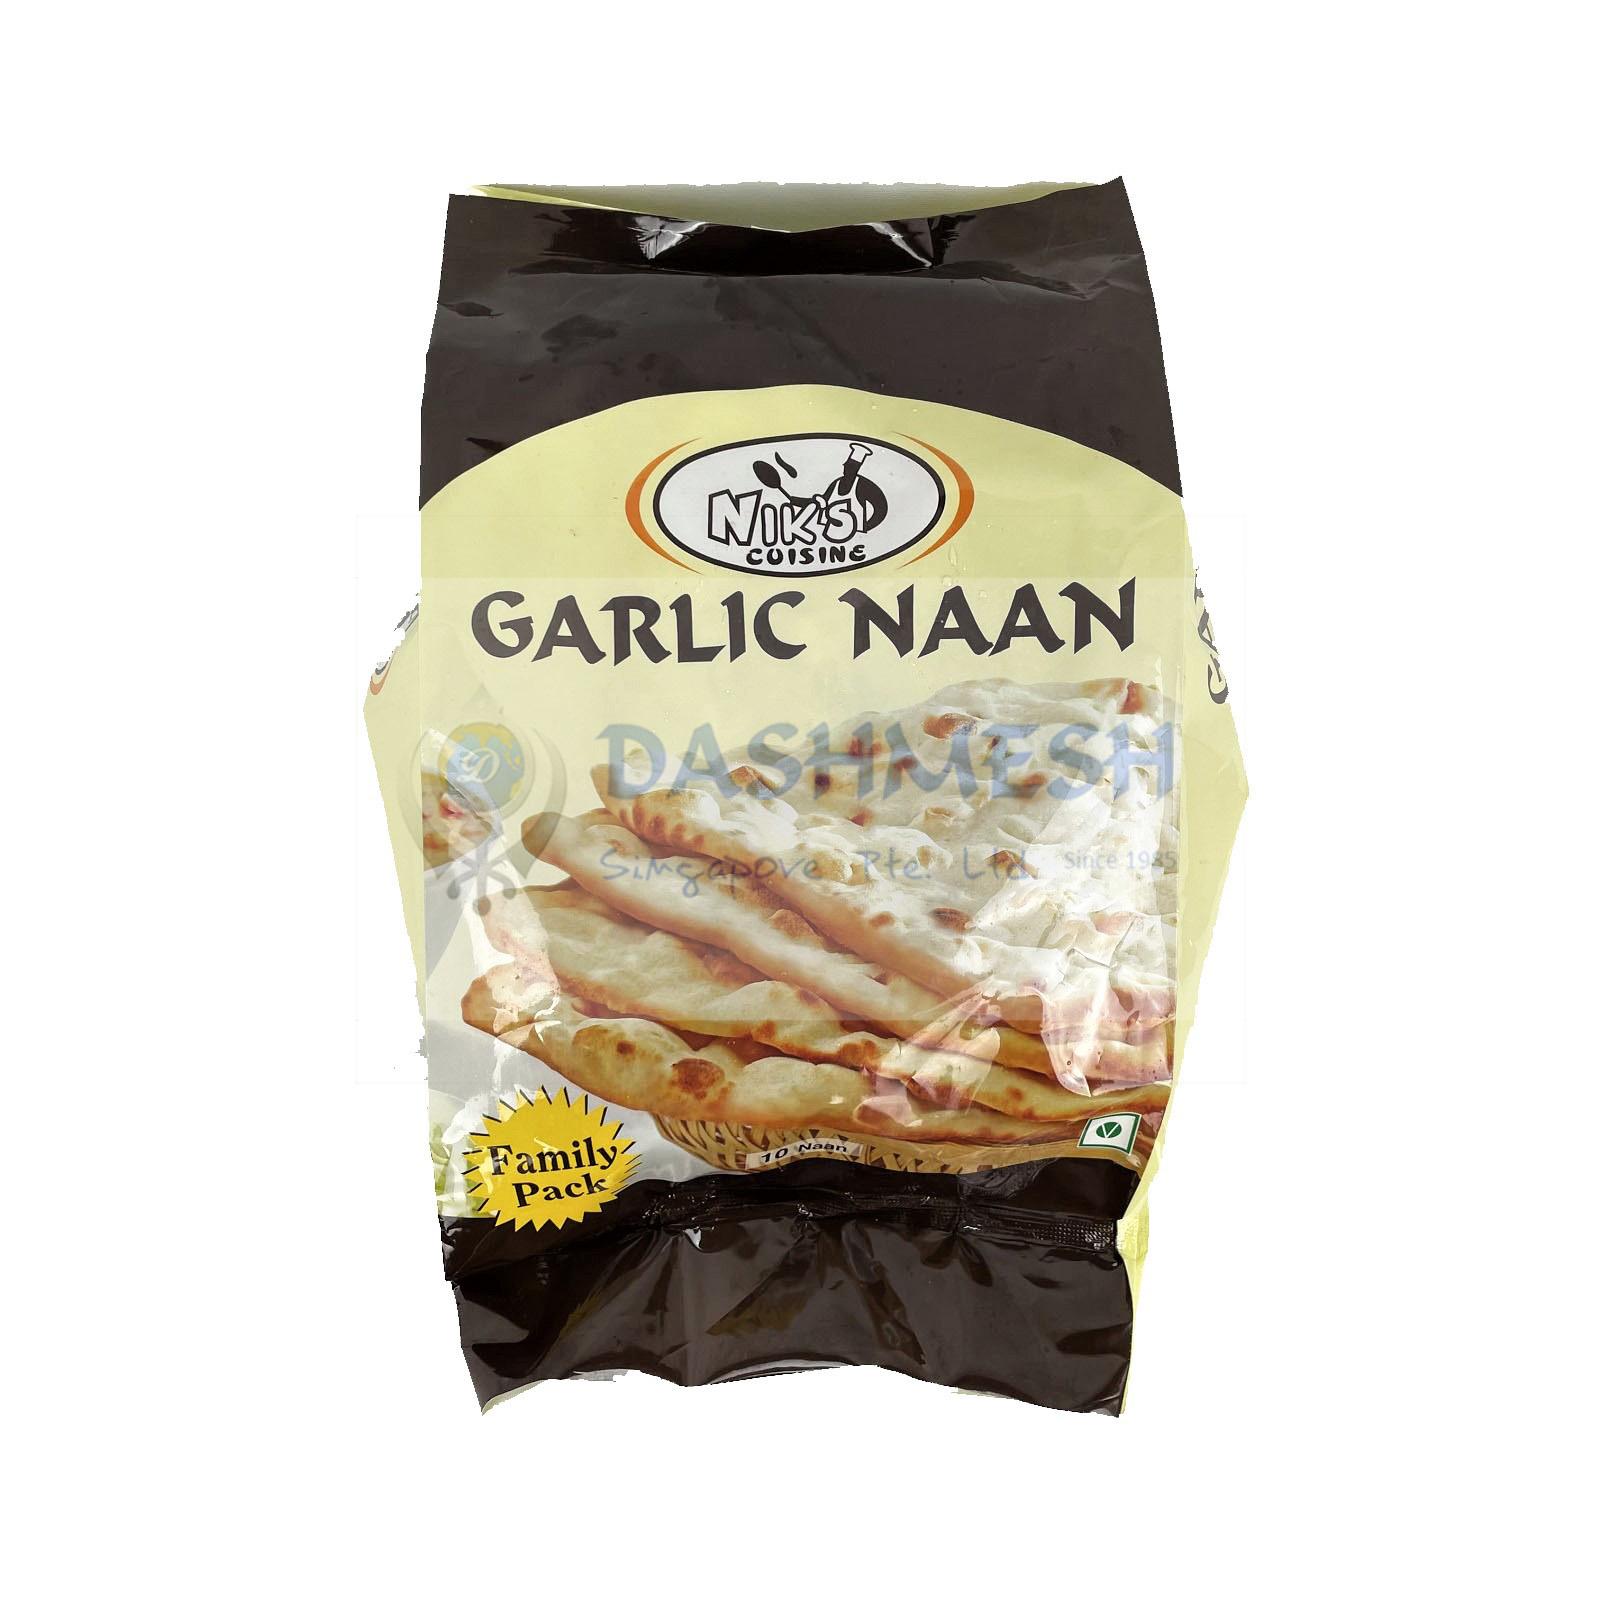 Niks Garlic Naan – 10s, 850g